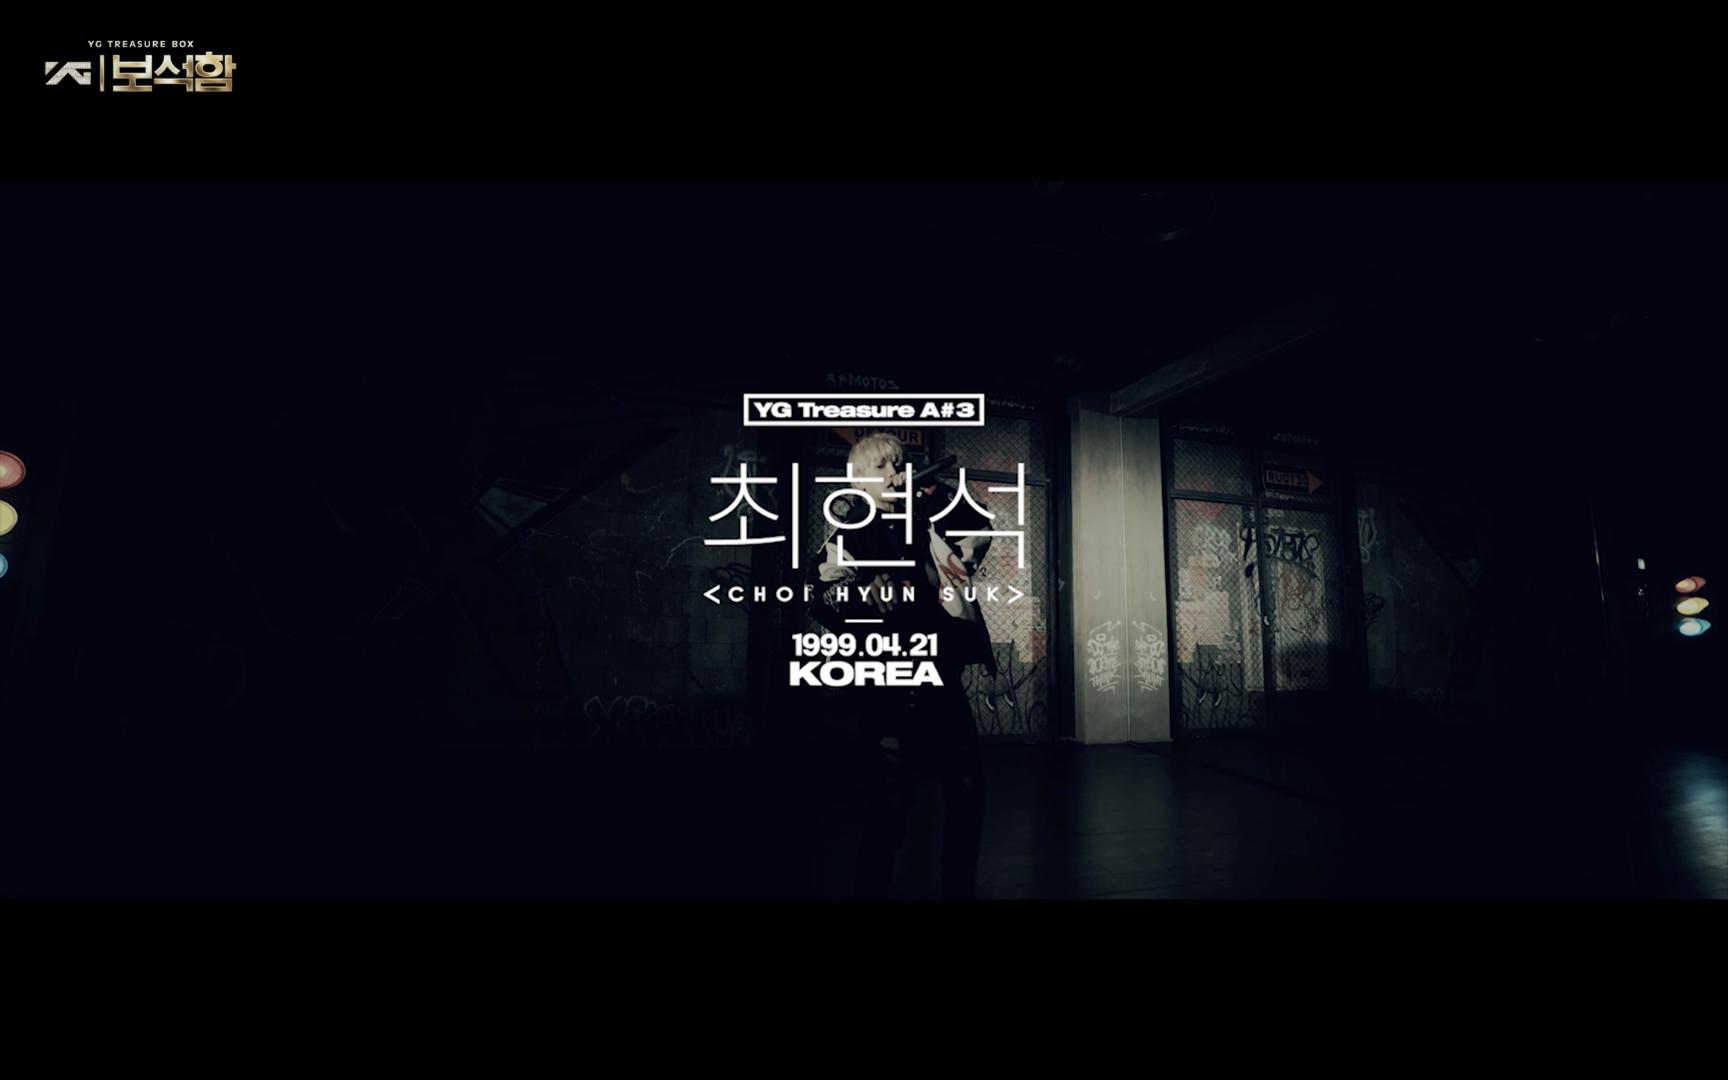 YG보석함ㅣ#인터뷰+퍼포먼스_TREASURE A#3 최현석 <CHOI HYUN SUK>